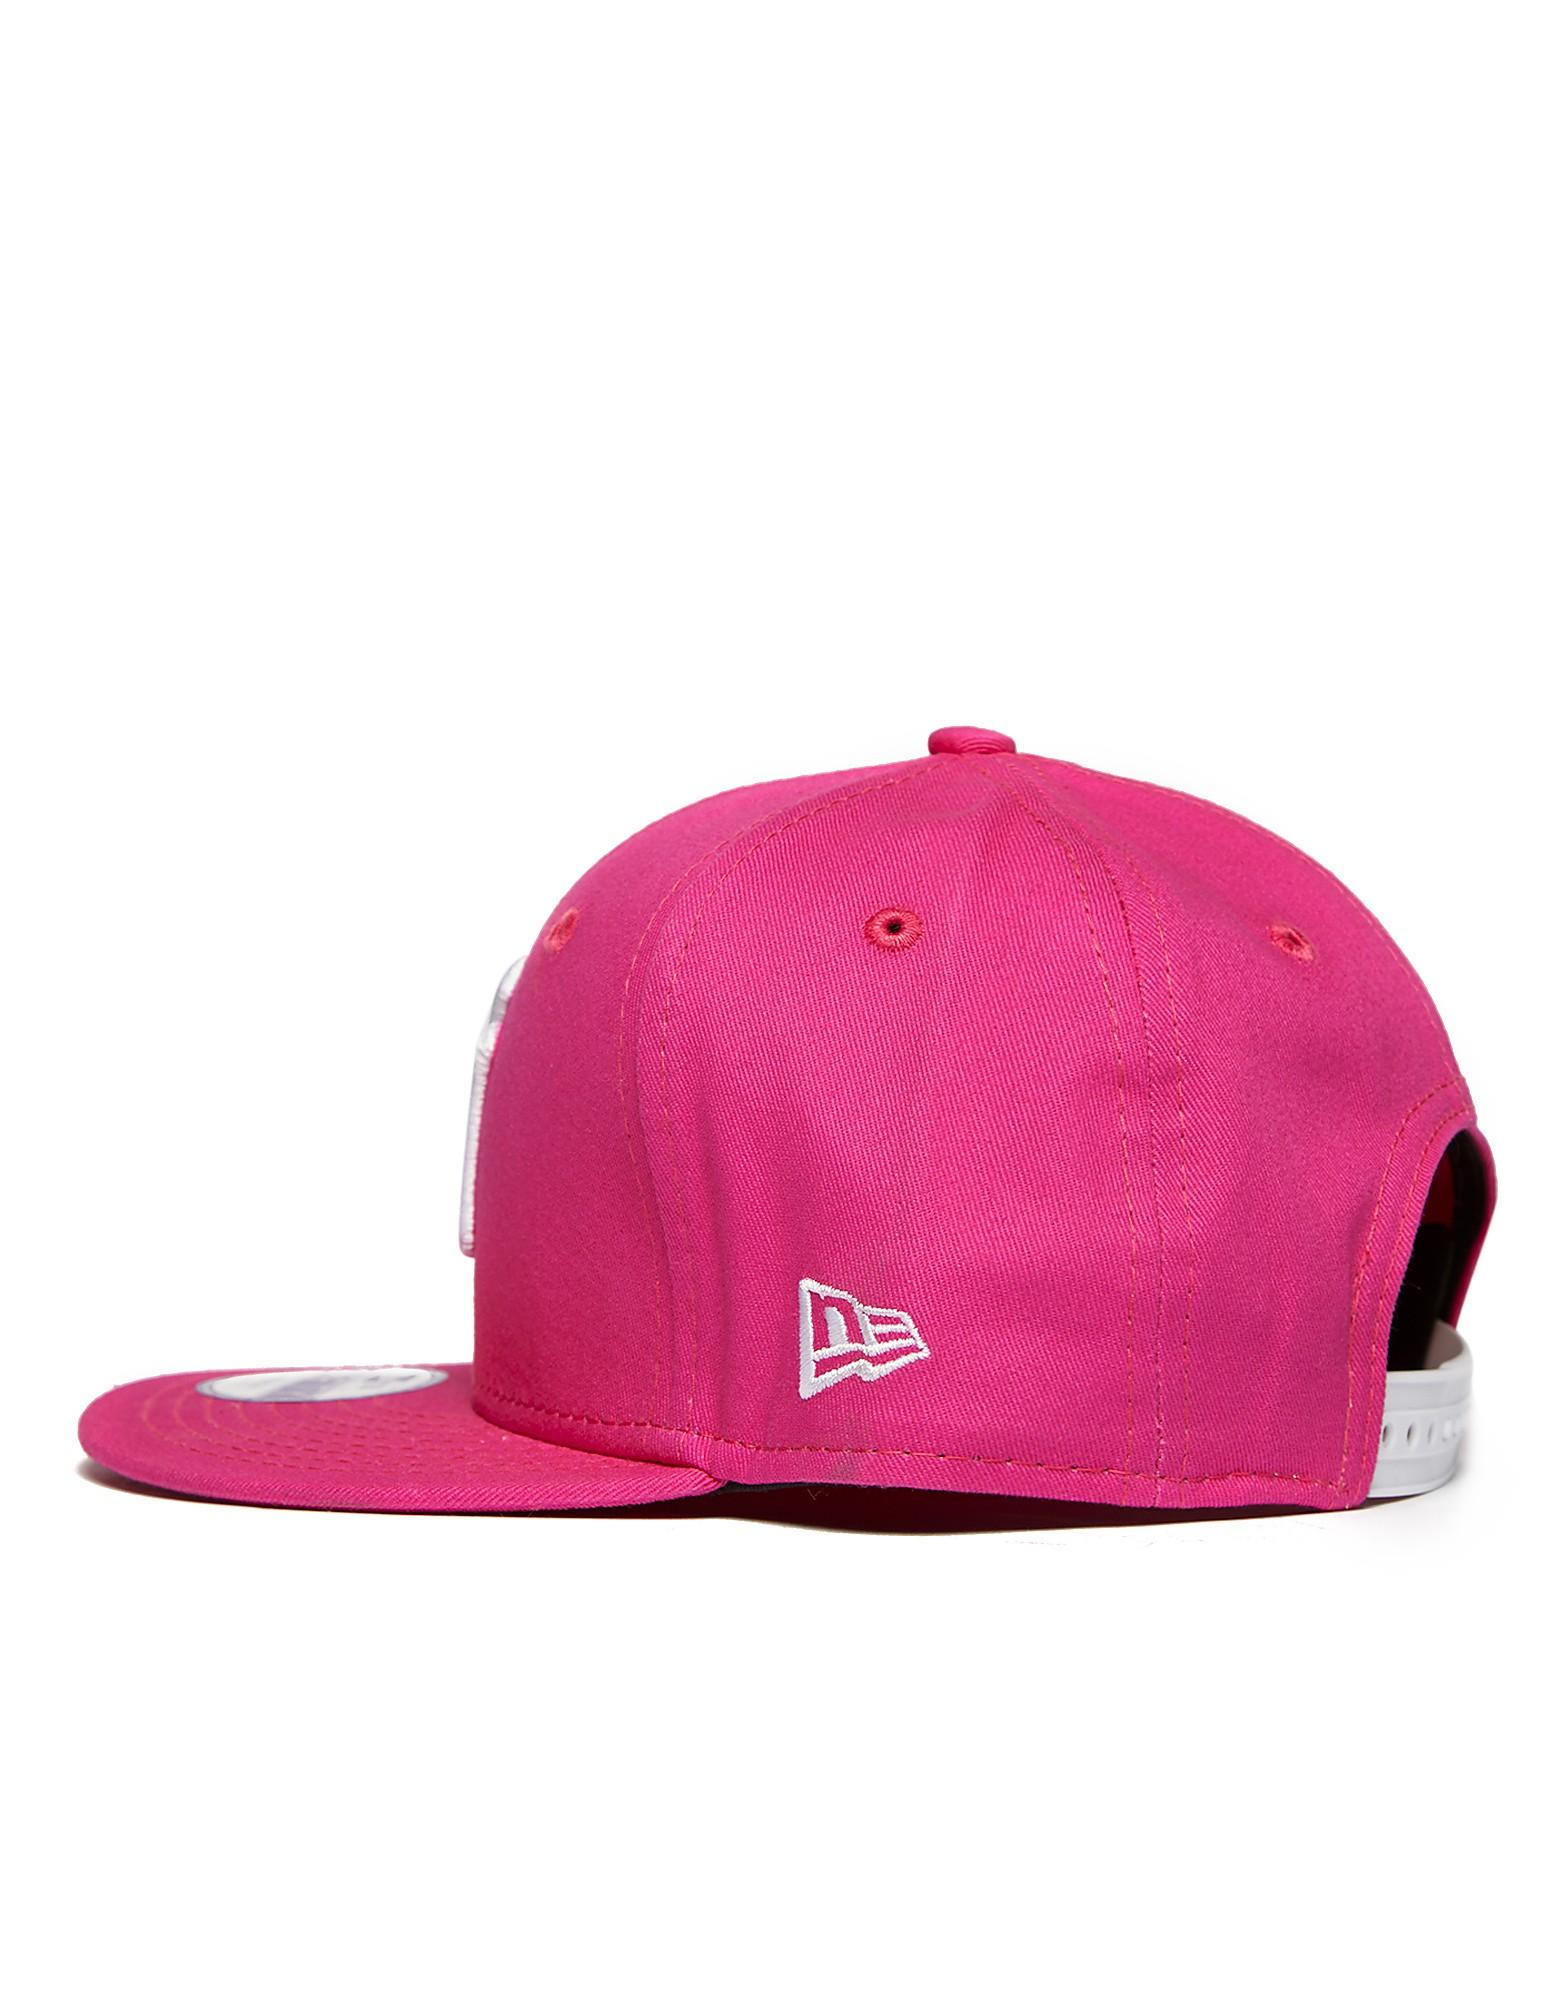 New Era MLB New York Yankees 9FIFTY Junior Snapback Cap